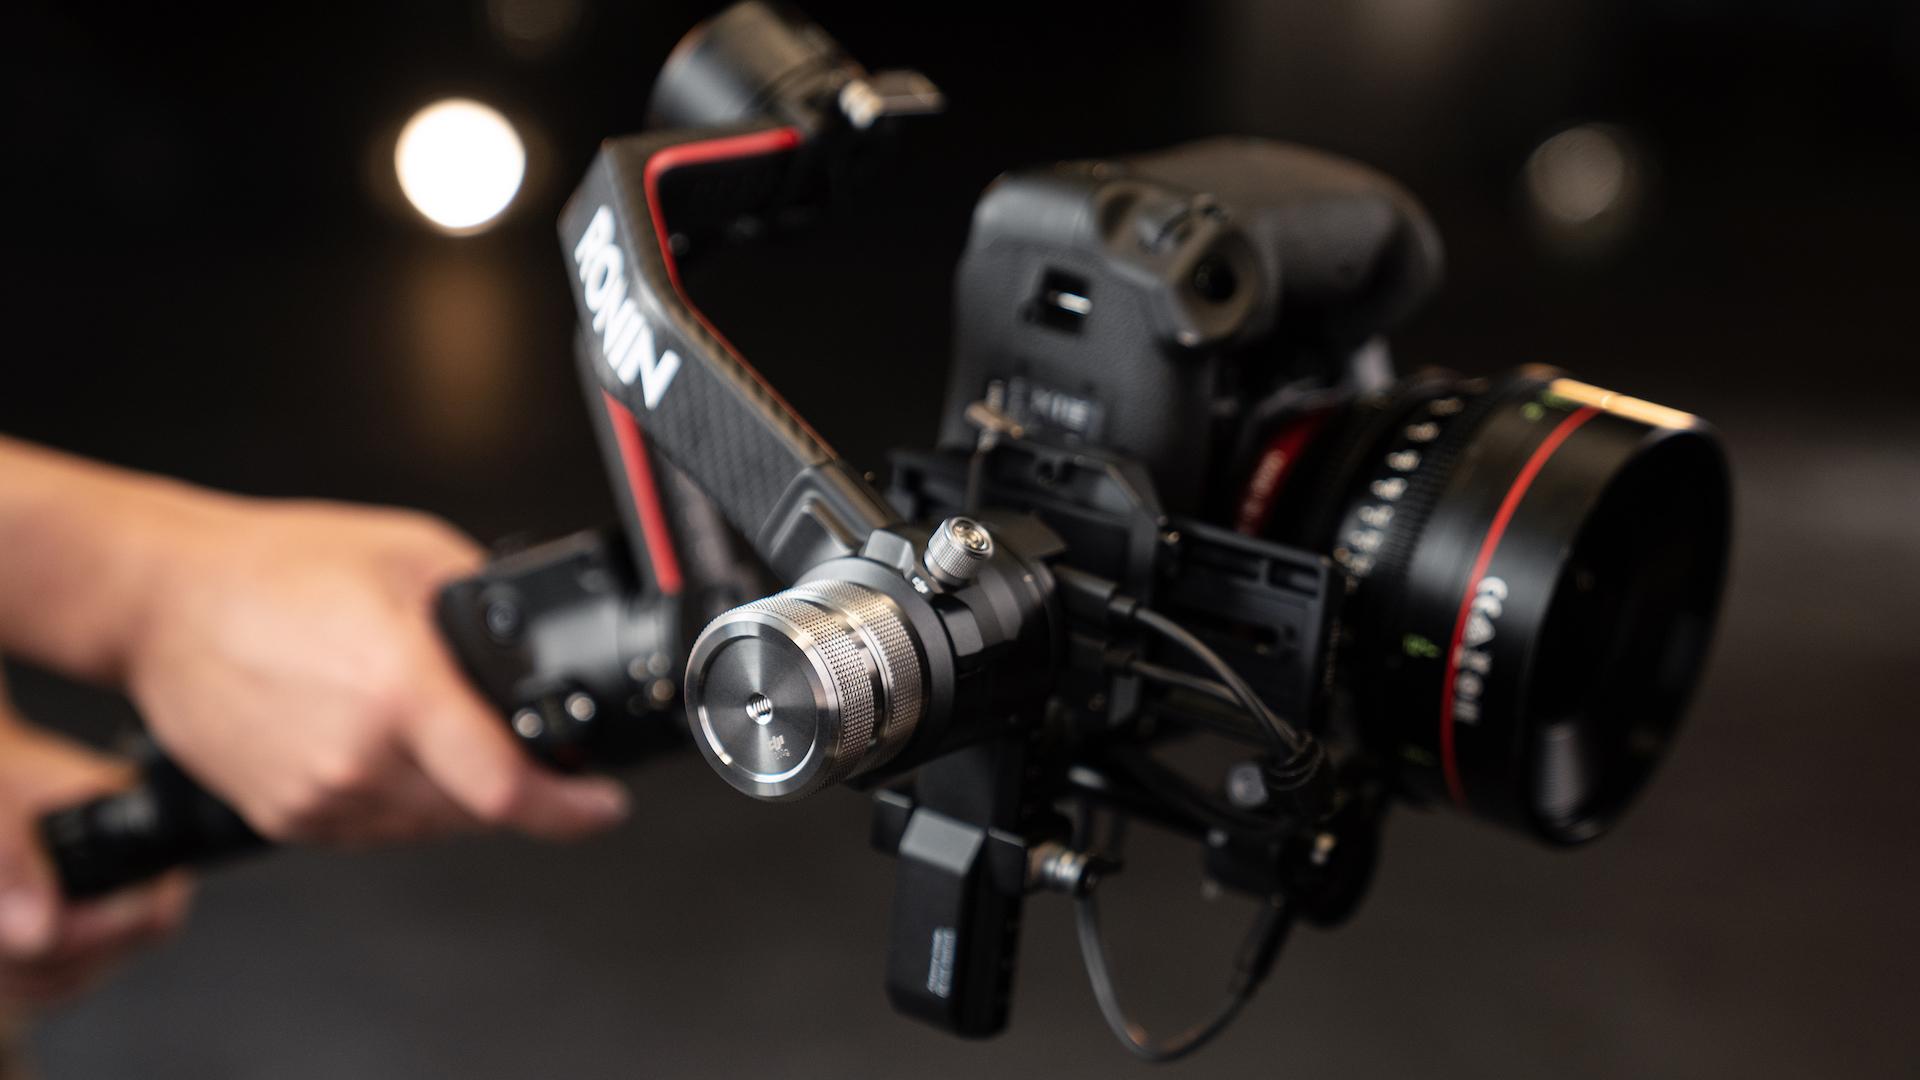 A hand holding the DJI Ronin 2 camera gimbal